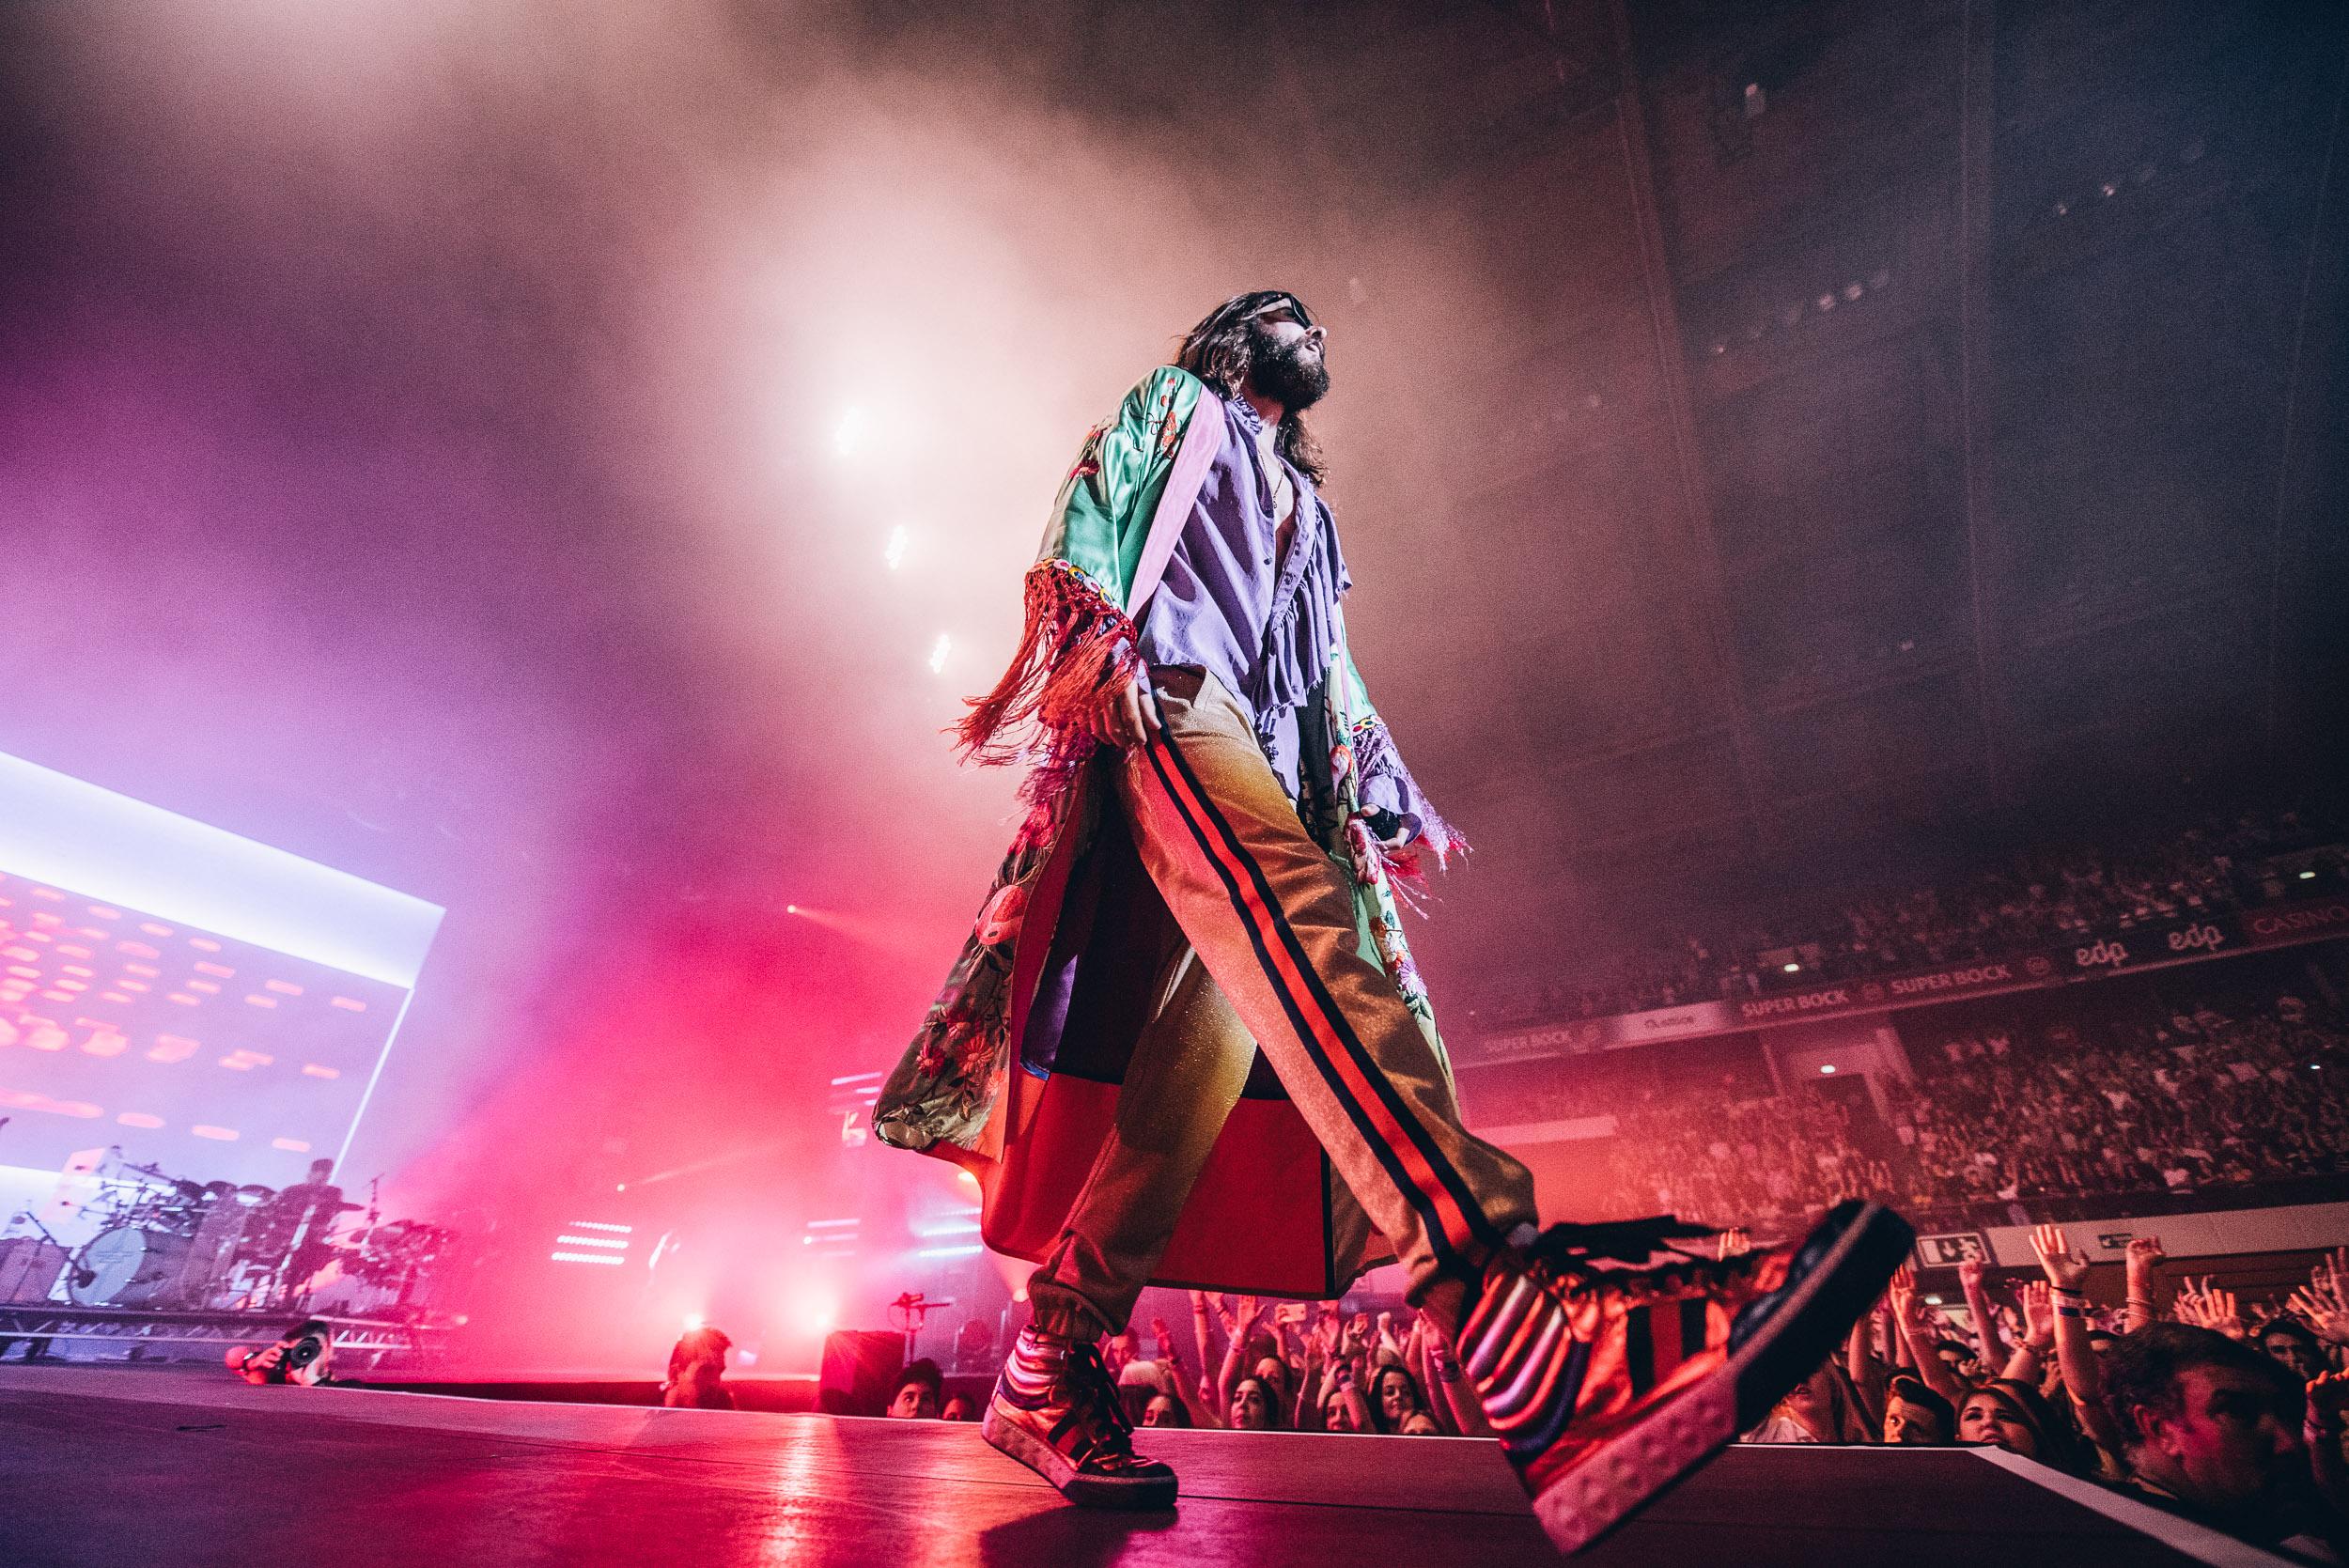 30 Seconds to Mars Altice Arena 20180912-757.jpg